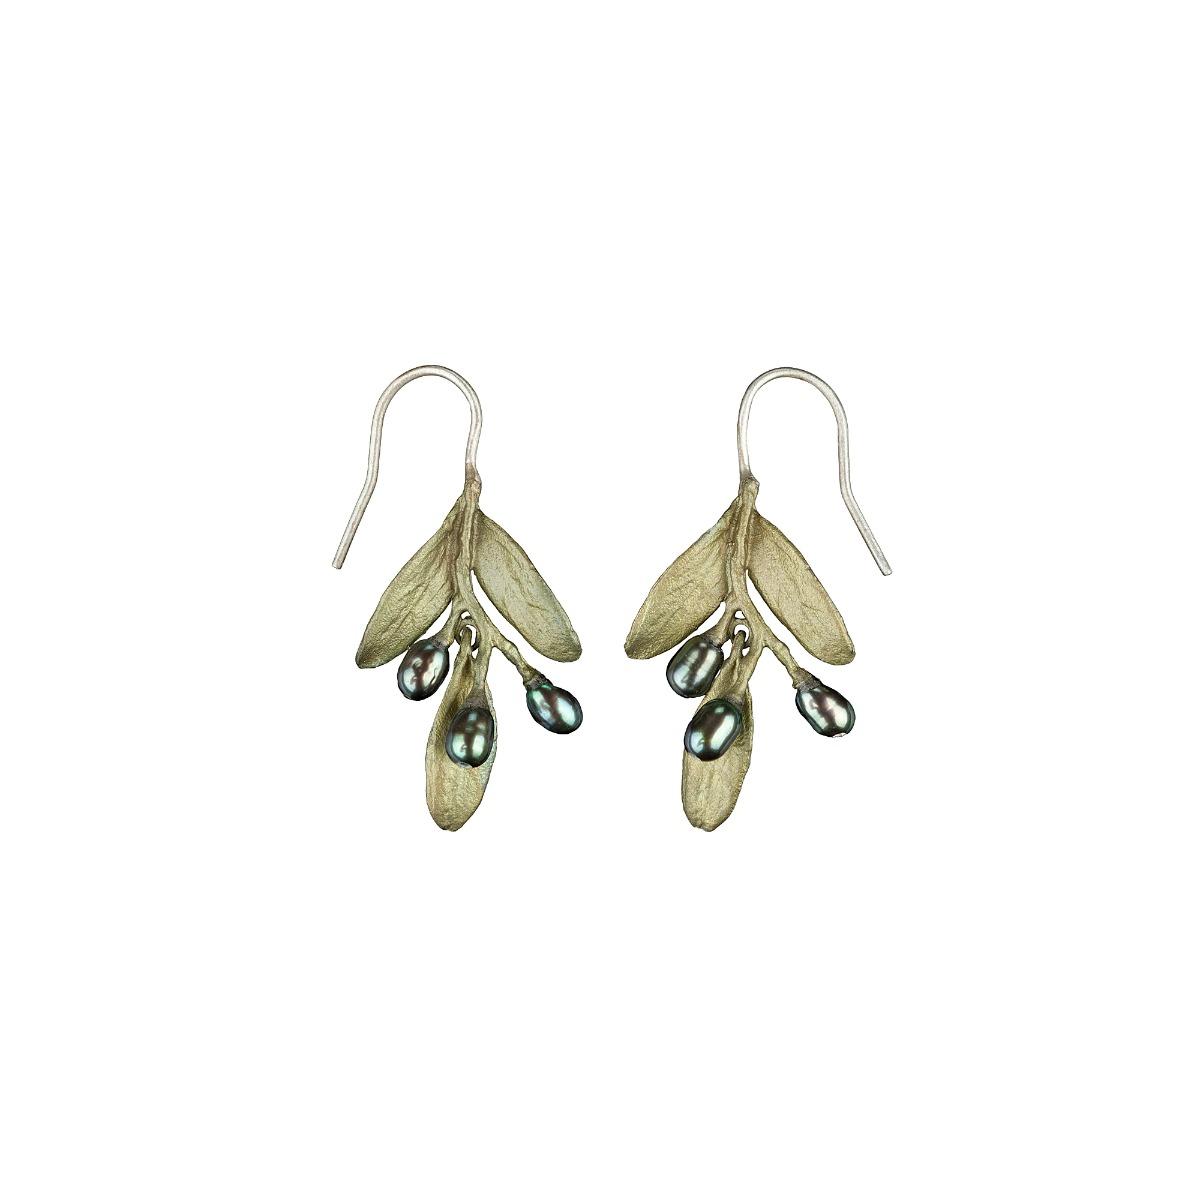 Olive pearl drop earrings